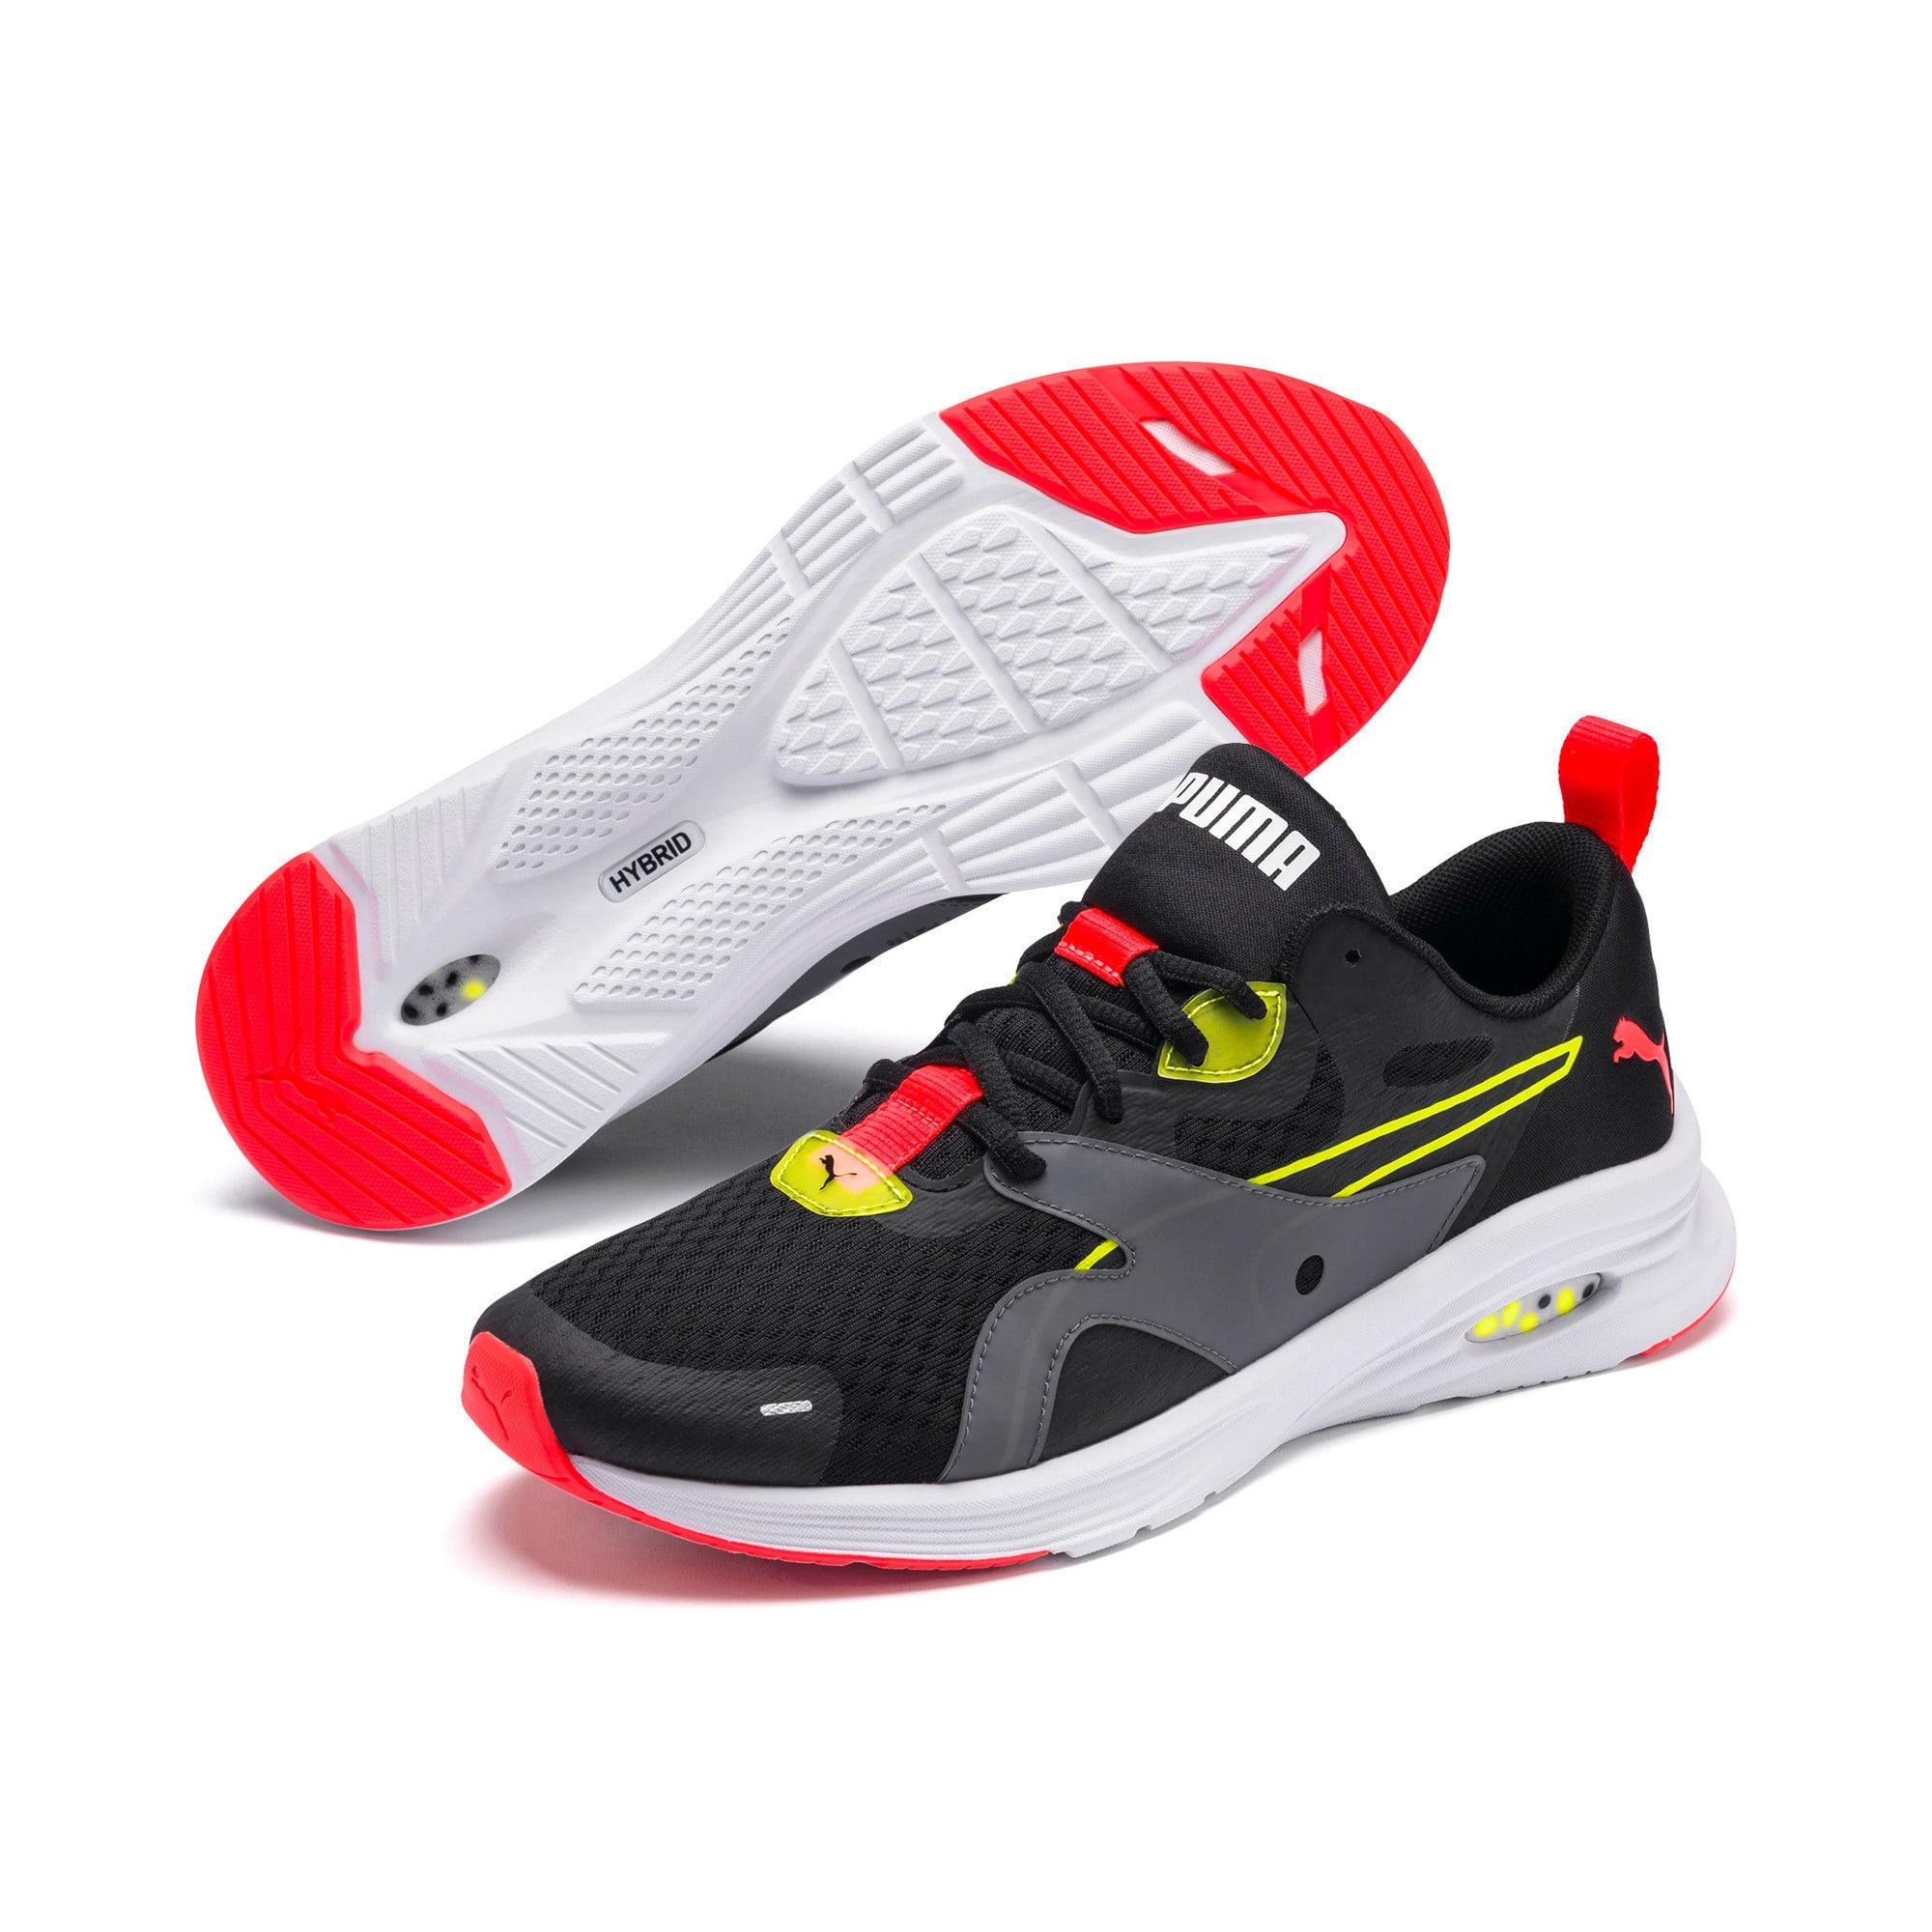 Thumbnail 6 of HYBRID Fuego Men's Running Shoes, Puma Black-Yellow Alert, medium-IND